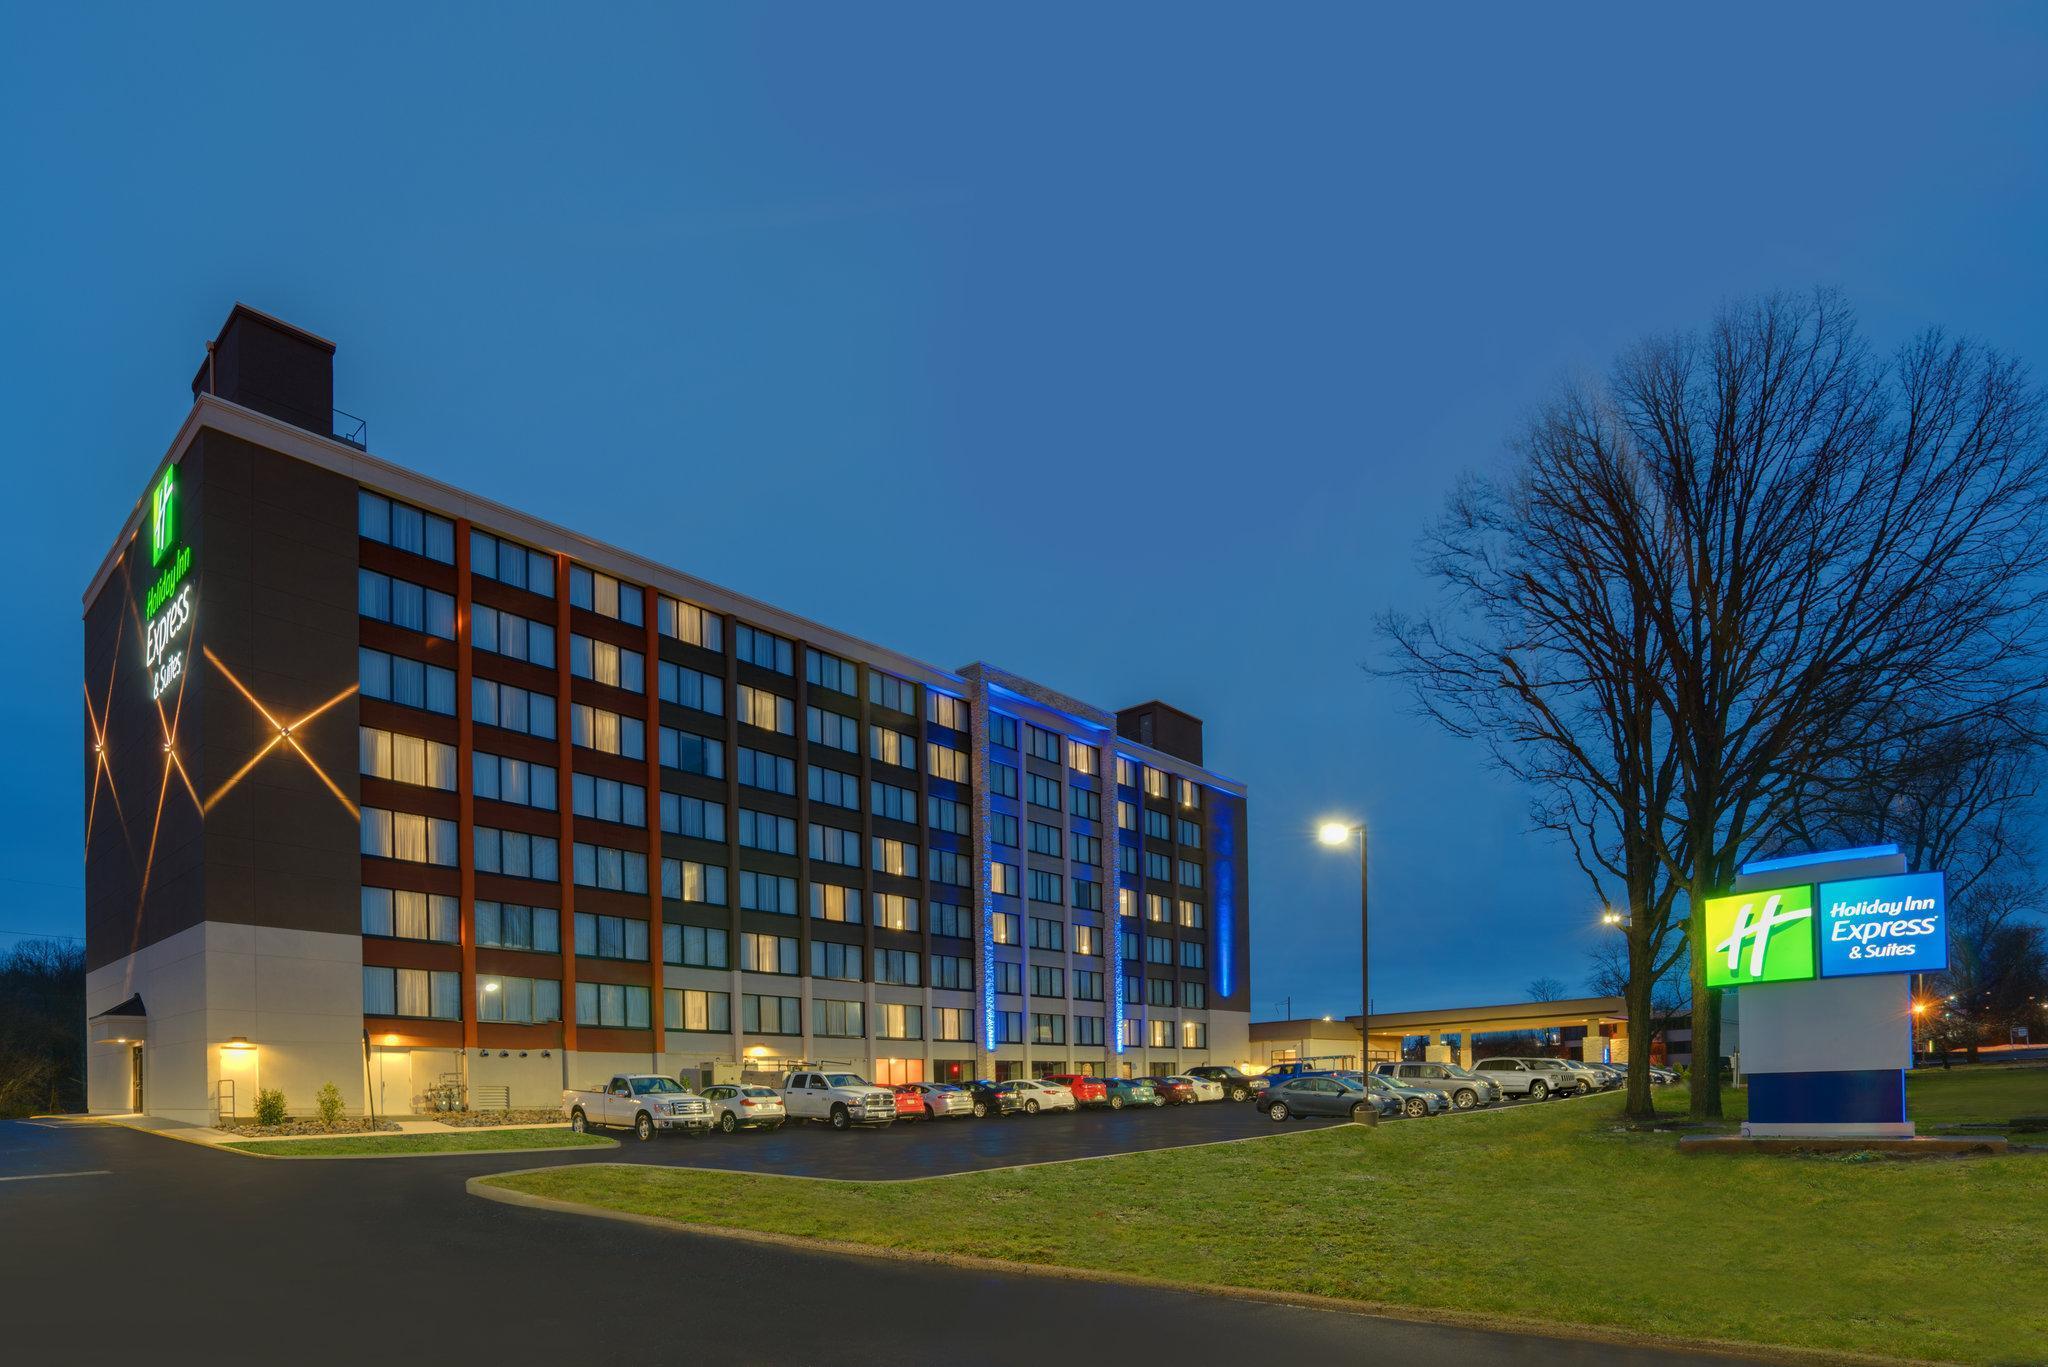 Holiday Inn Express & Suites Ft. Washington   Philadelphia